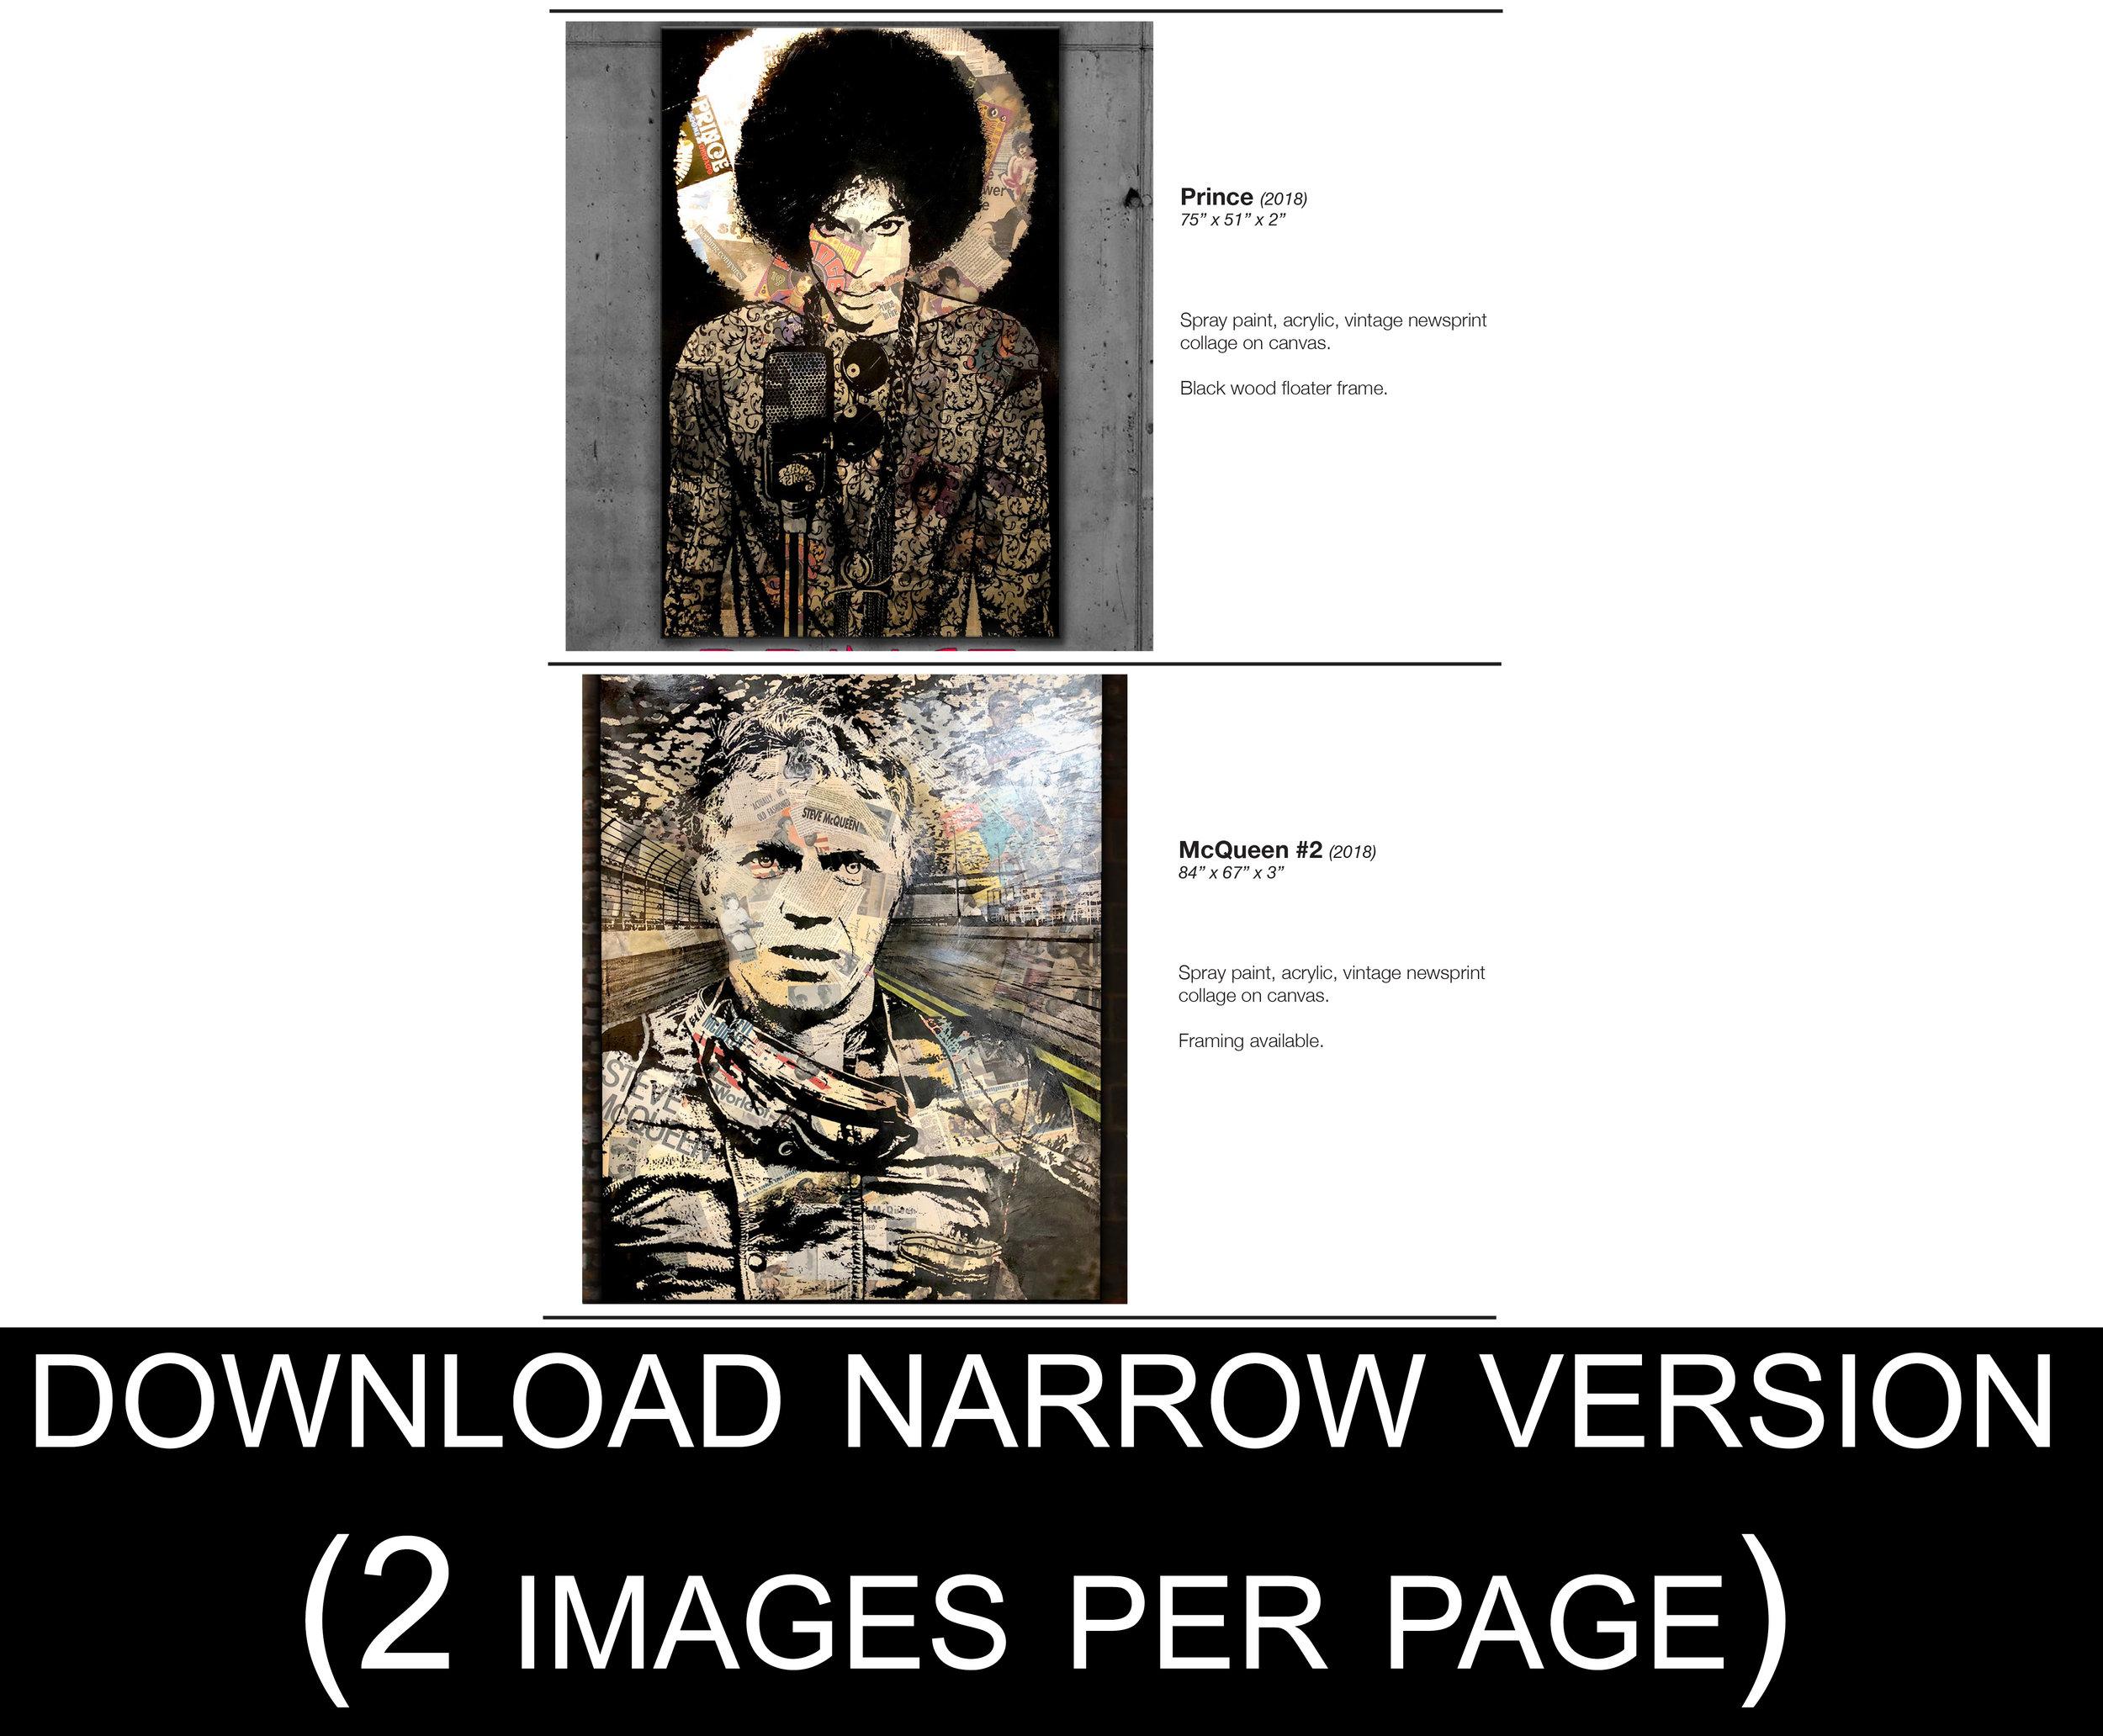 narrow_download.jpg